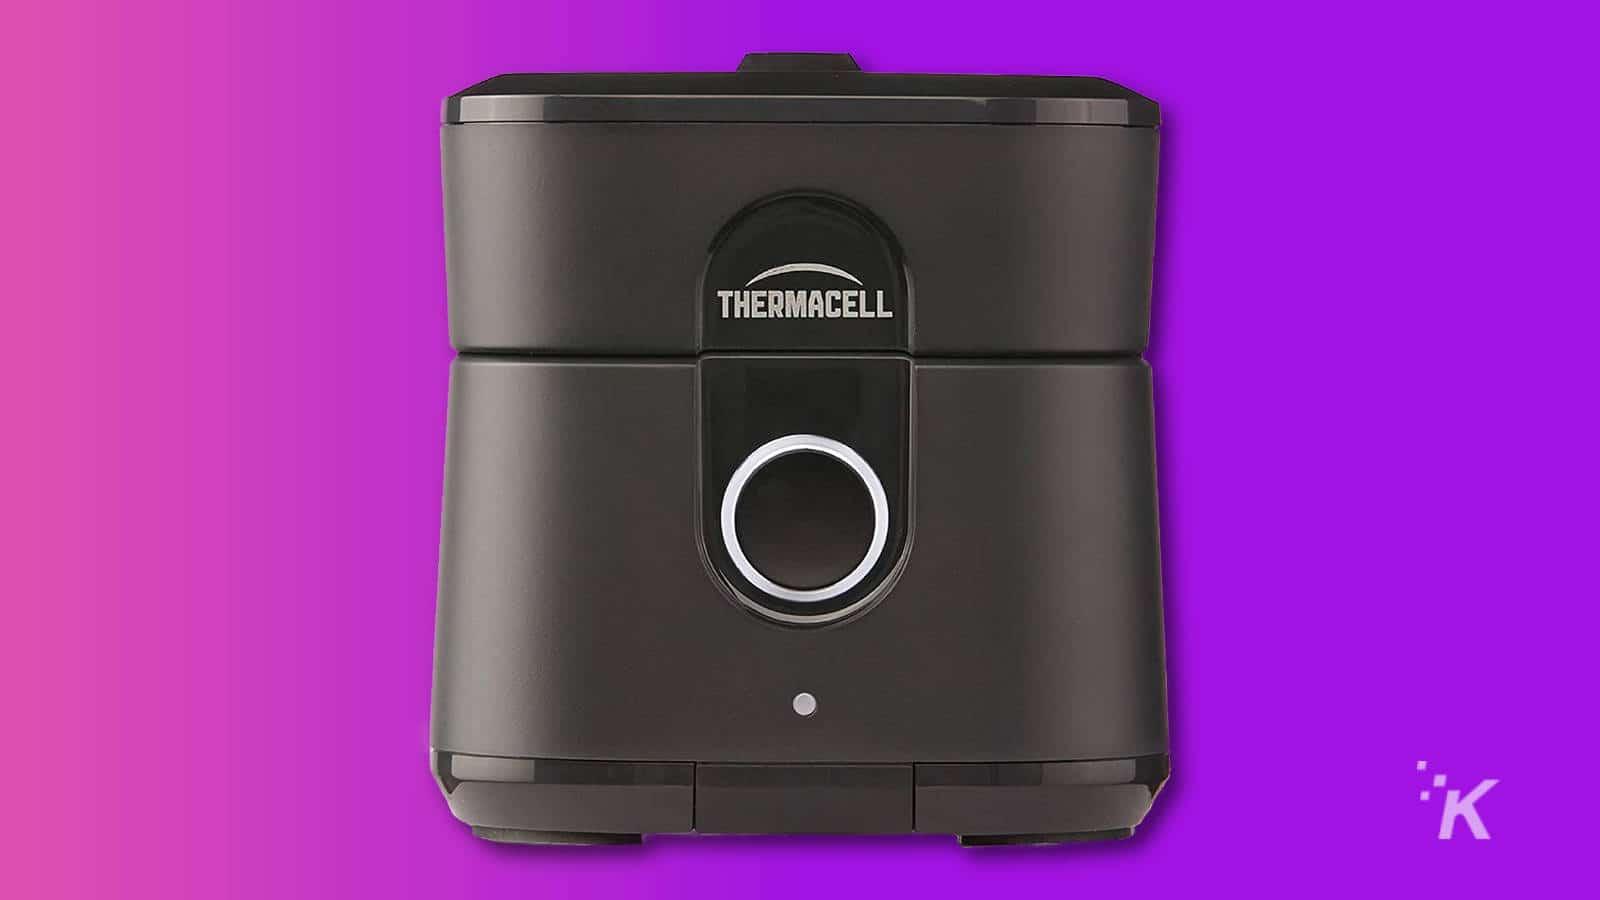 thermacell radius anti-mosquito device